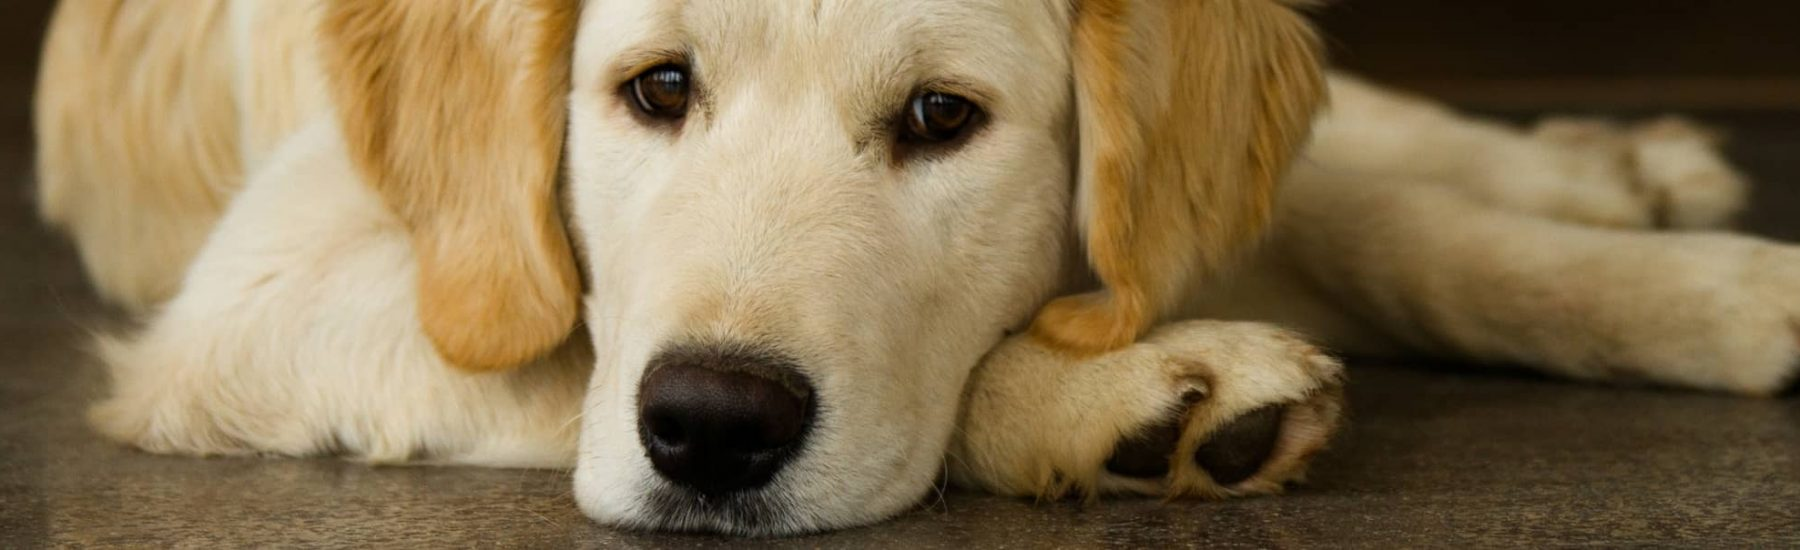 Dog Heartworm Test